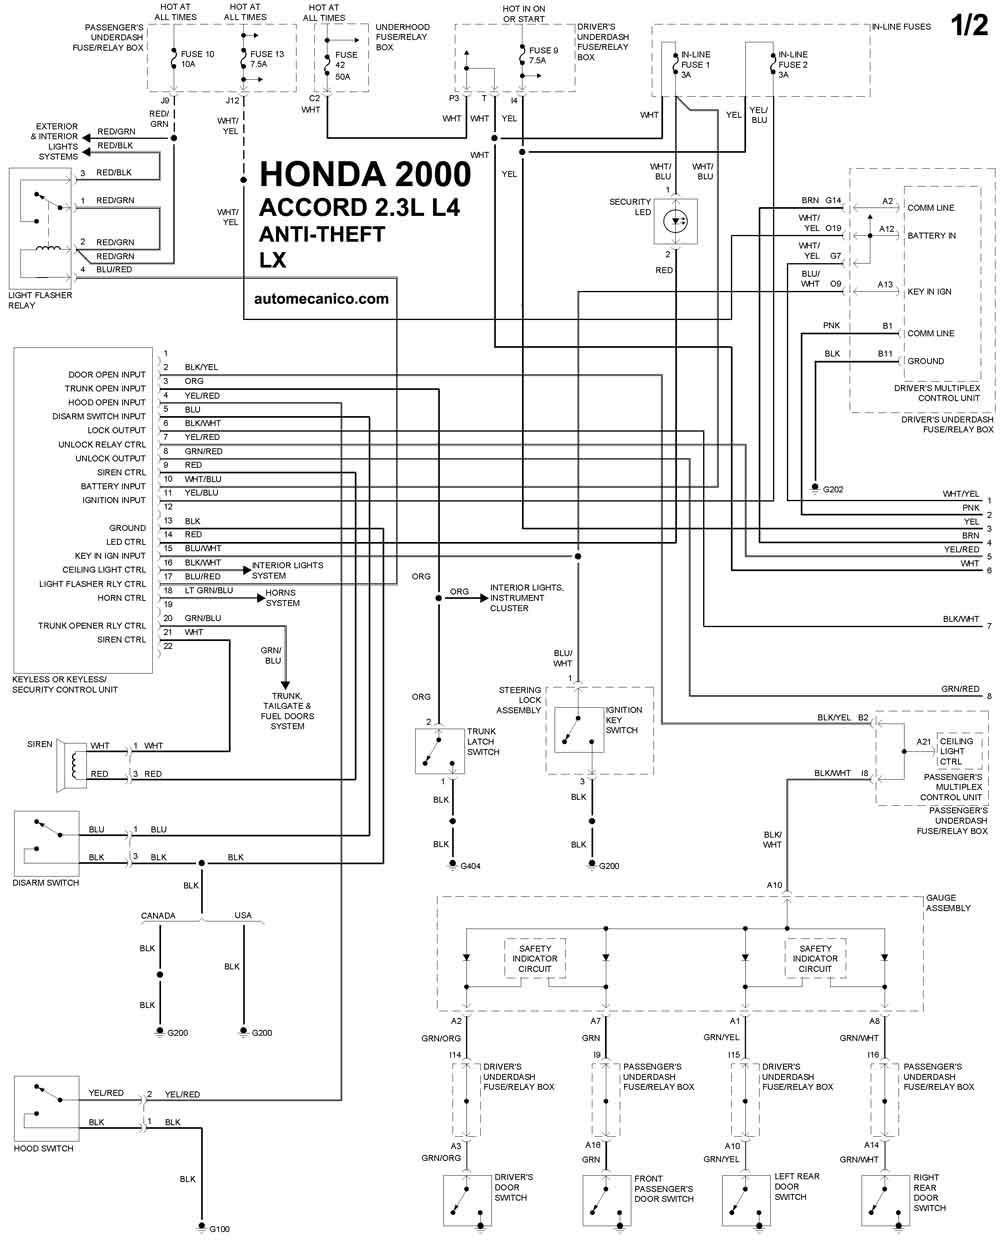 2009 civic anti theft wiring diagram. 98 taurus 3 0 dohc wont crank new  battery neutral safety. honda sistema antirobo anti theft system braking.  acura vigor 1992 wiring diagrams security anti theft.  2002-acura-tl-radio.info